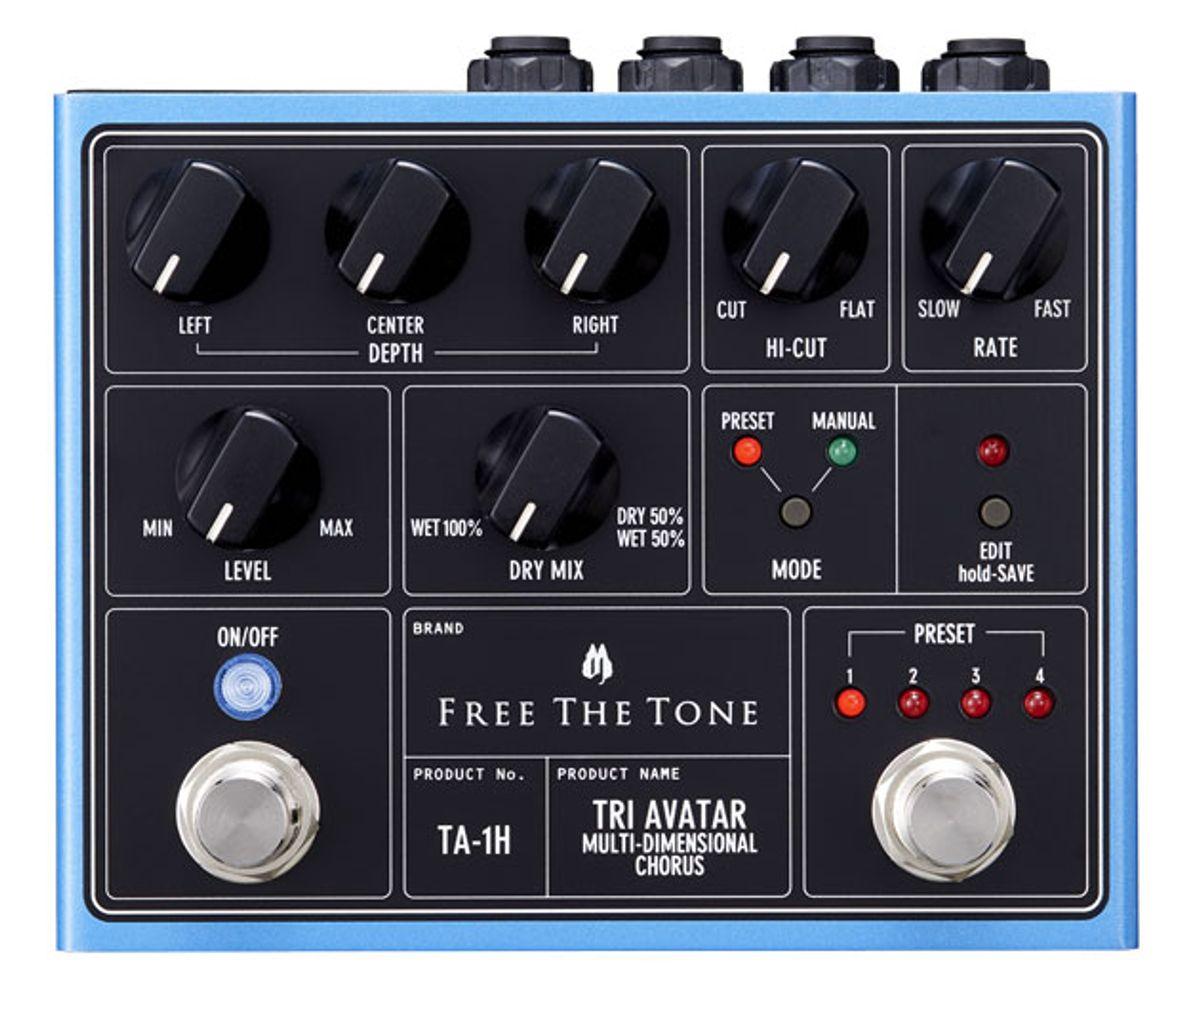 Free The Tone Introduces the TA-1H Tri Avatar